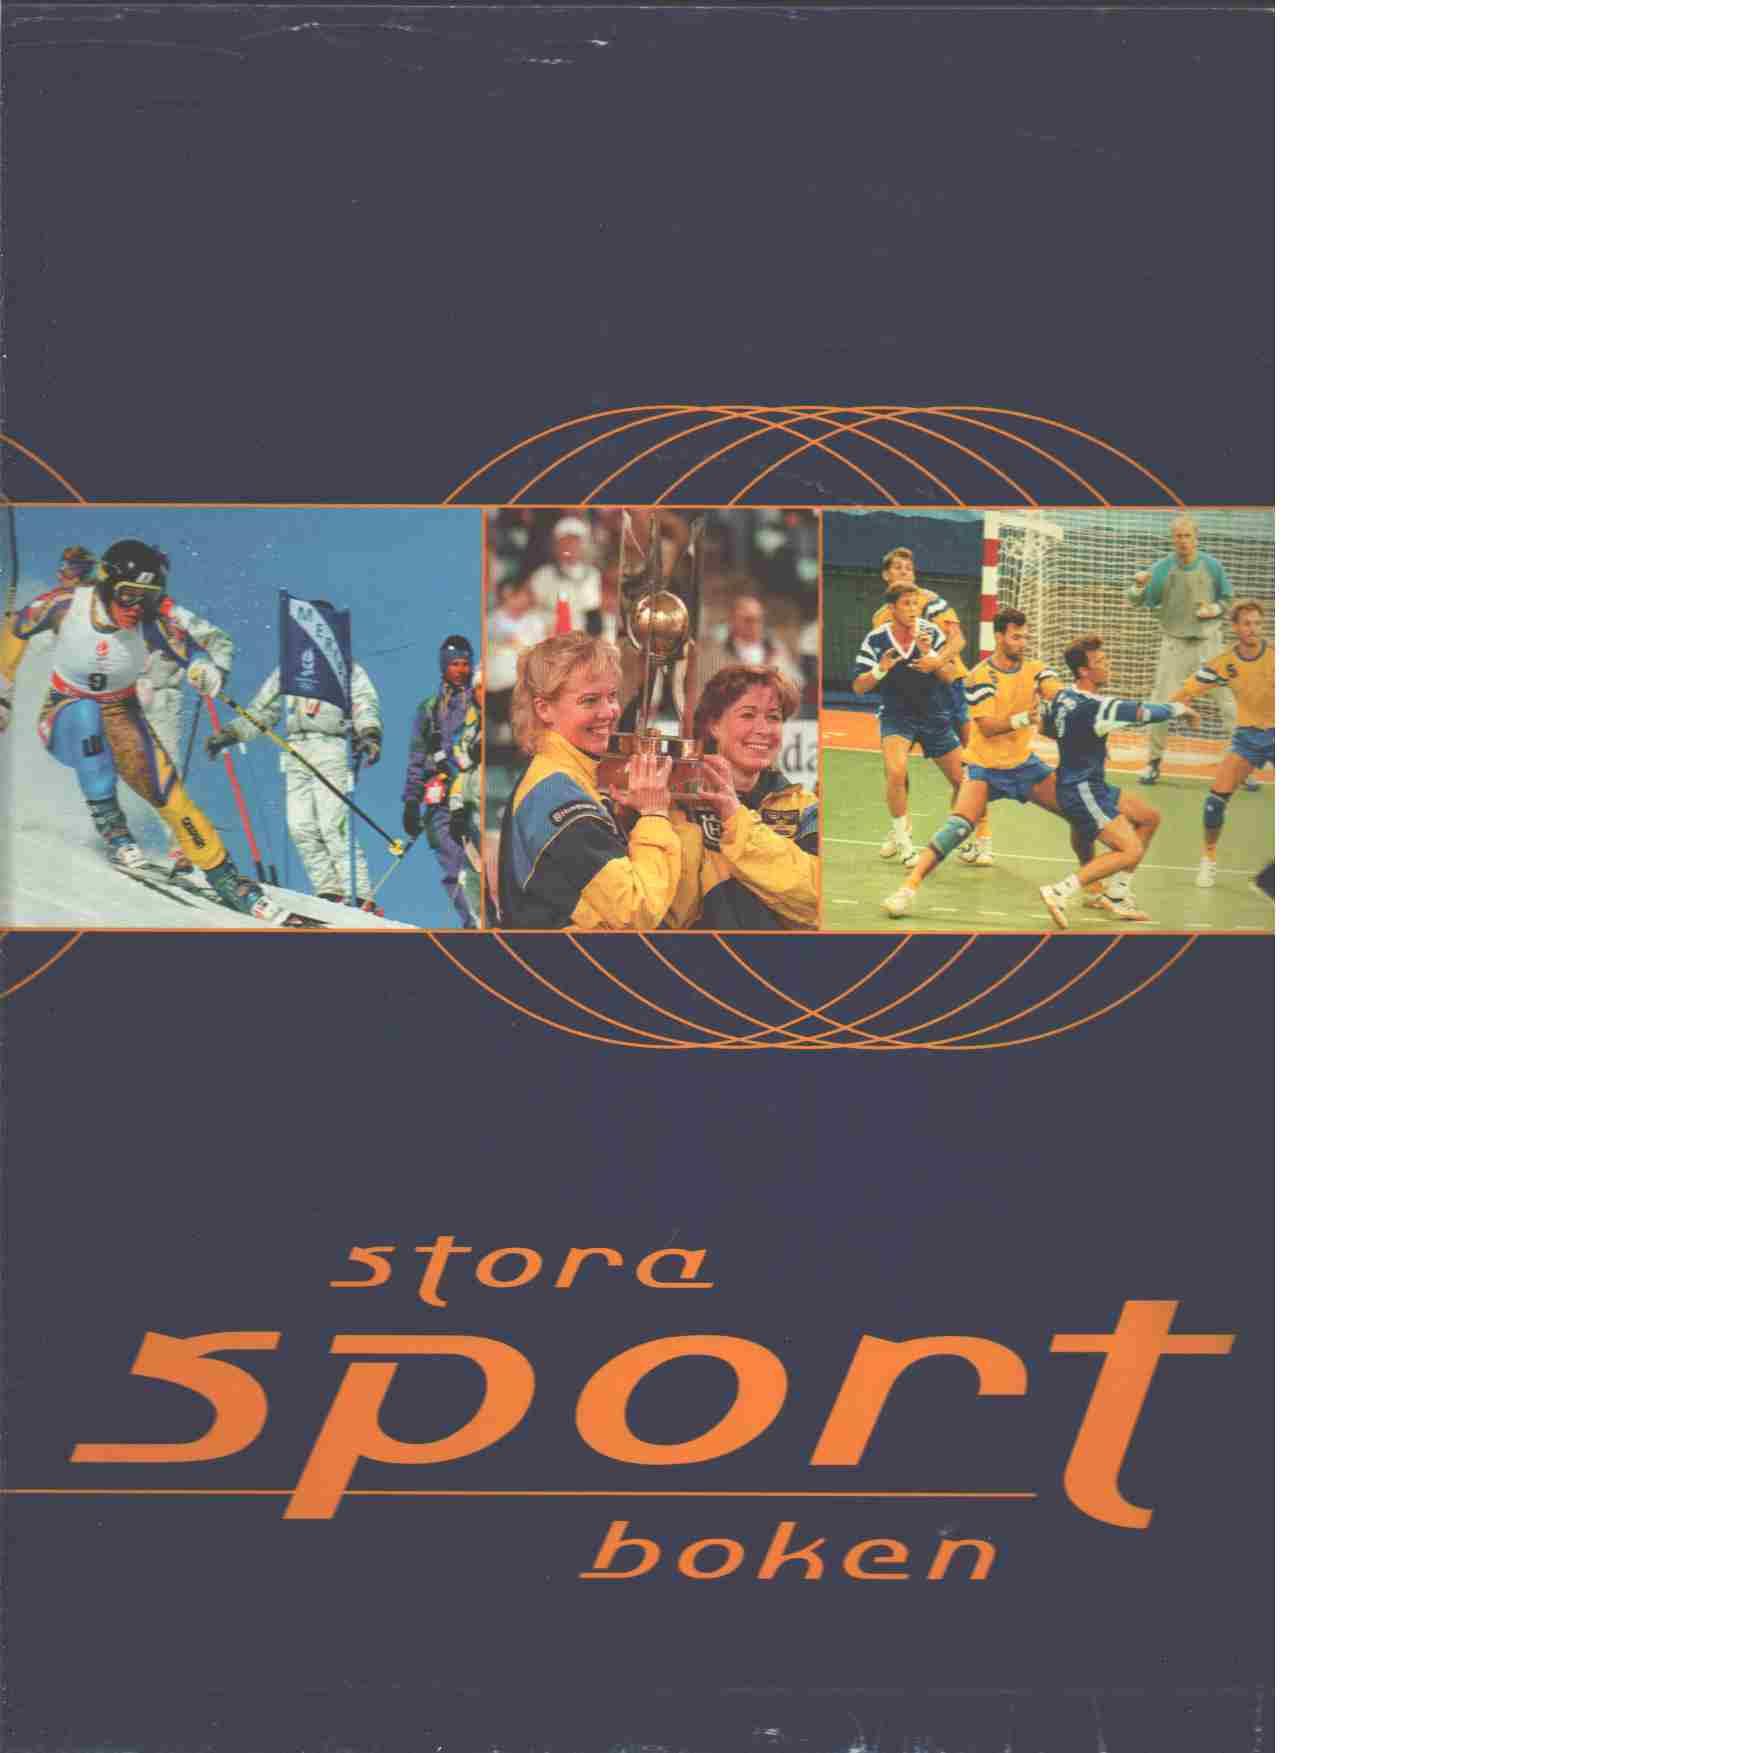 Den stora - sportboken. [4 + 5] - Red. Lindberg, Thomas